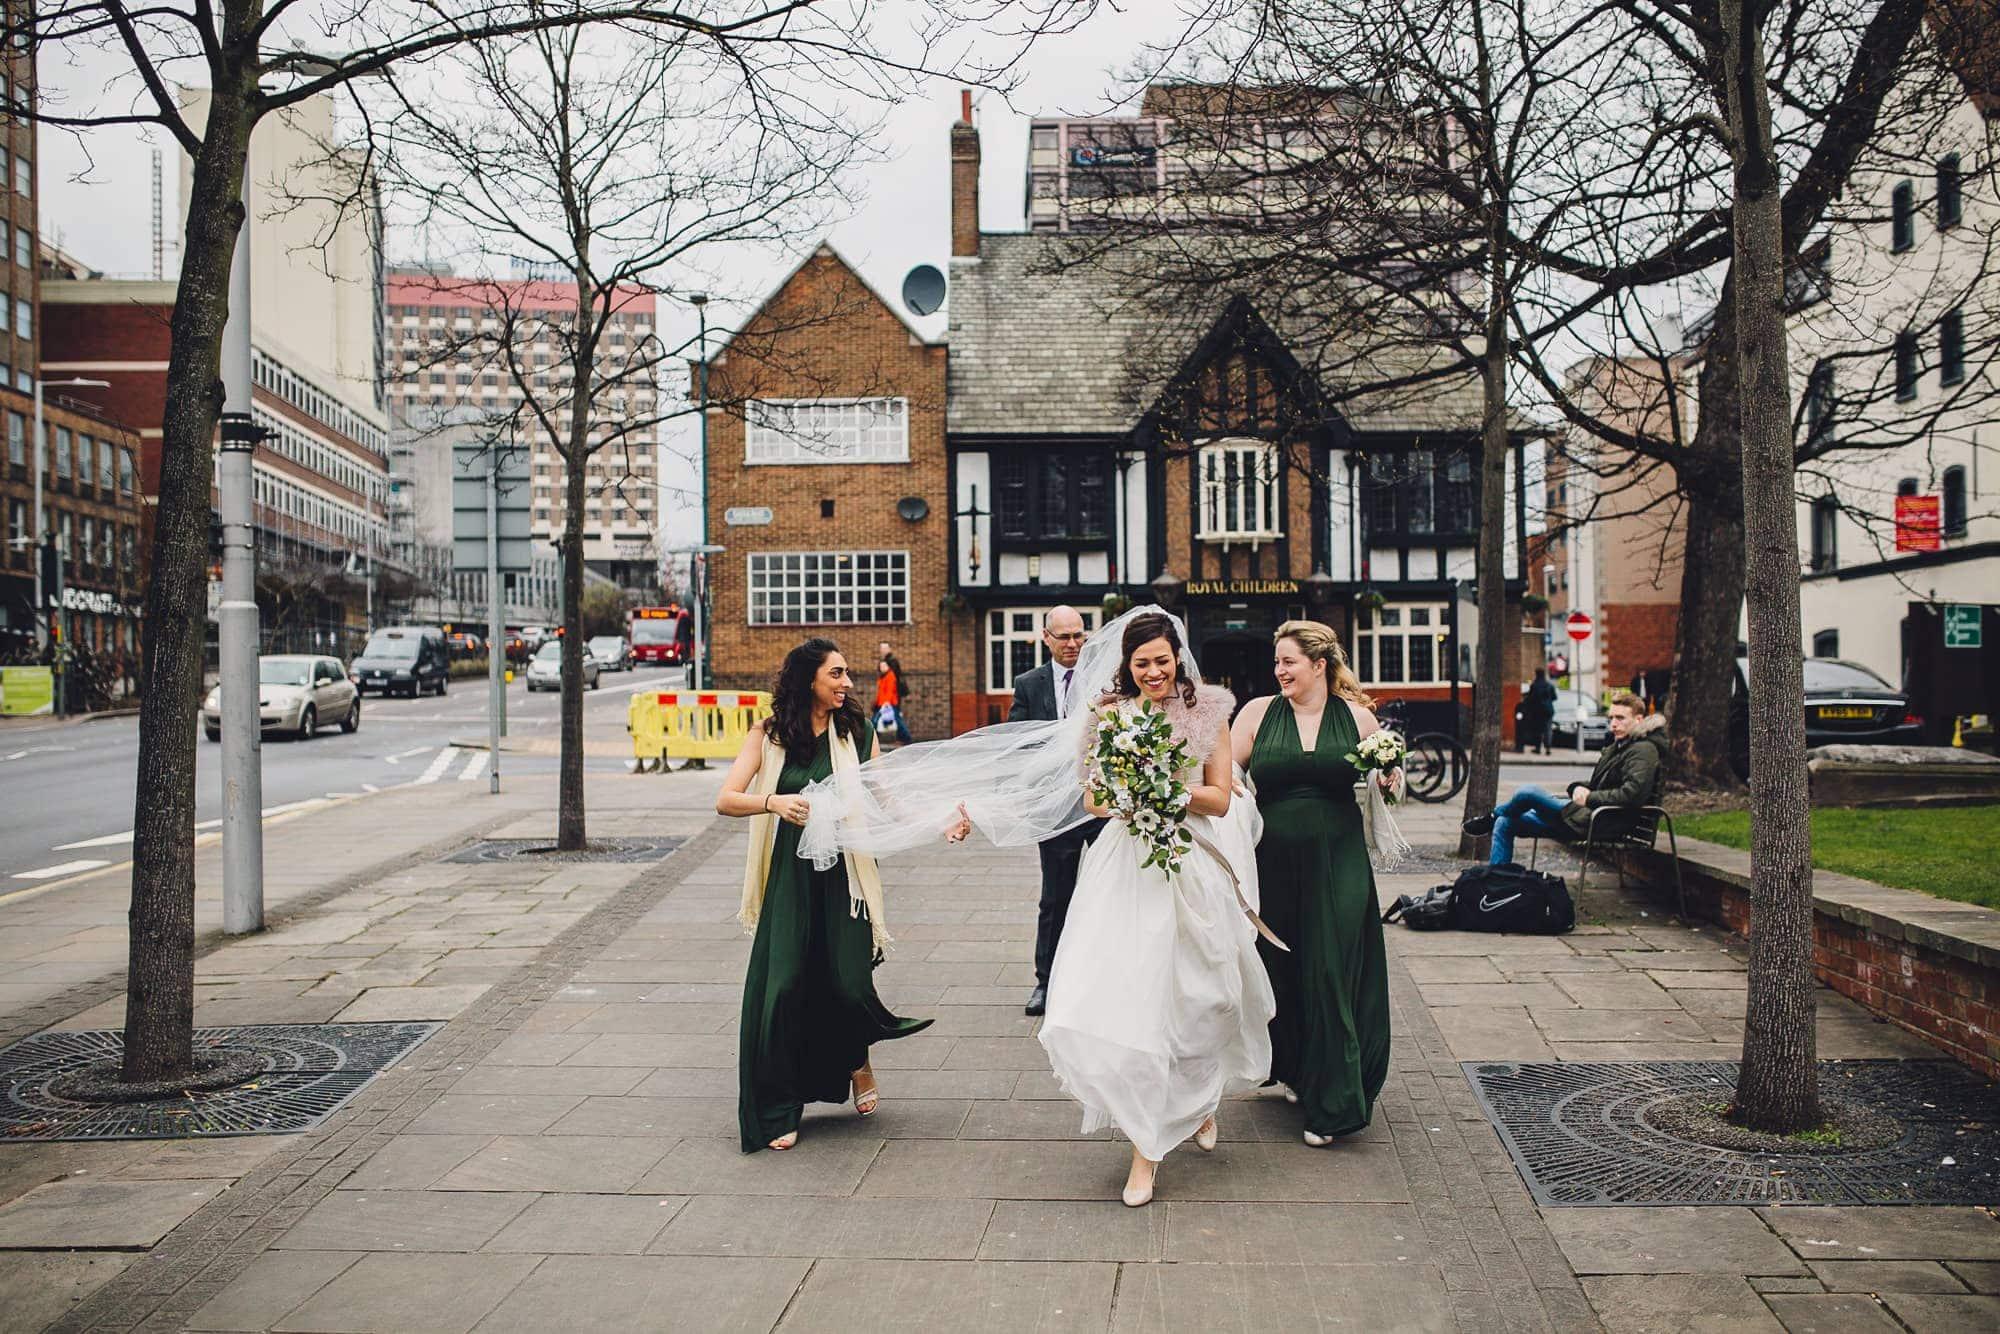 Matlt-Cross-Nottingham-wedding-Photography-22